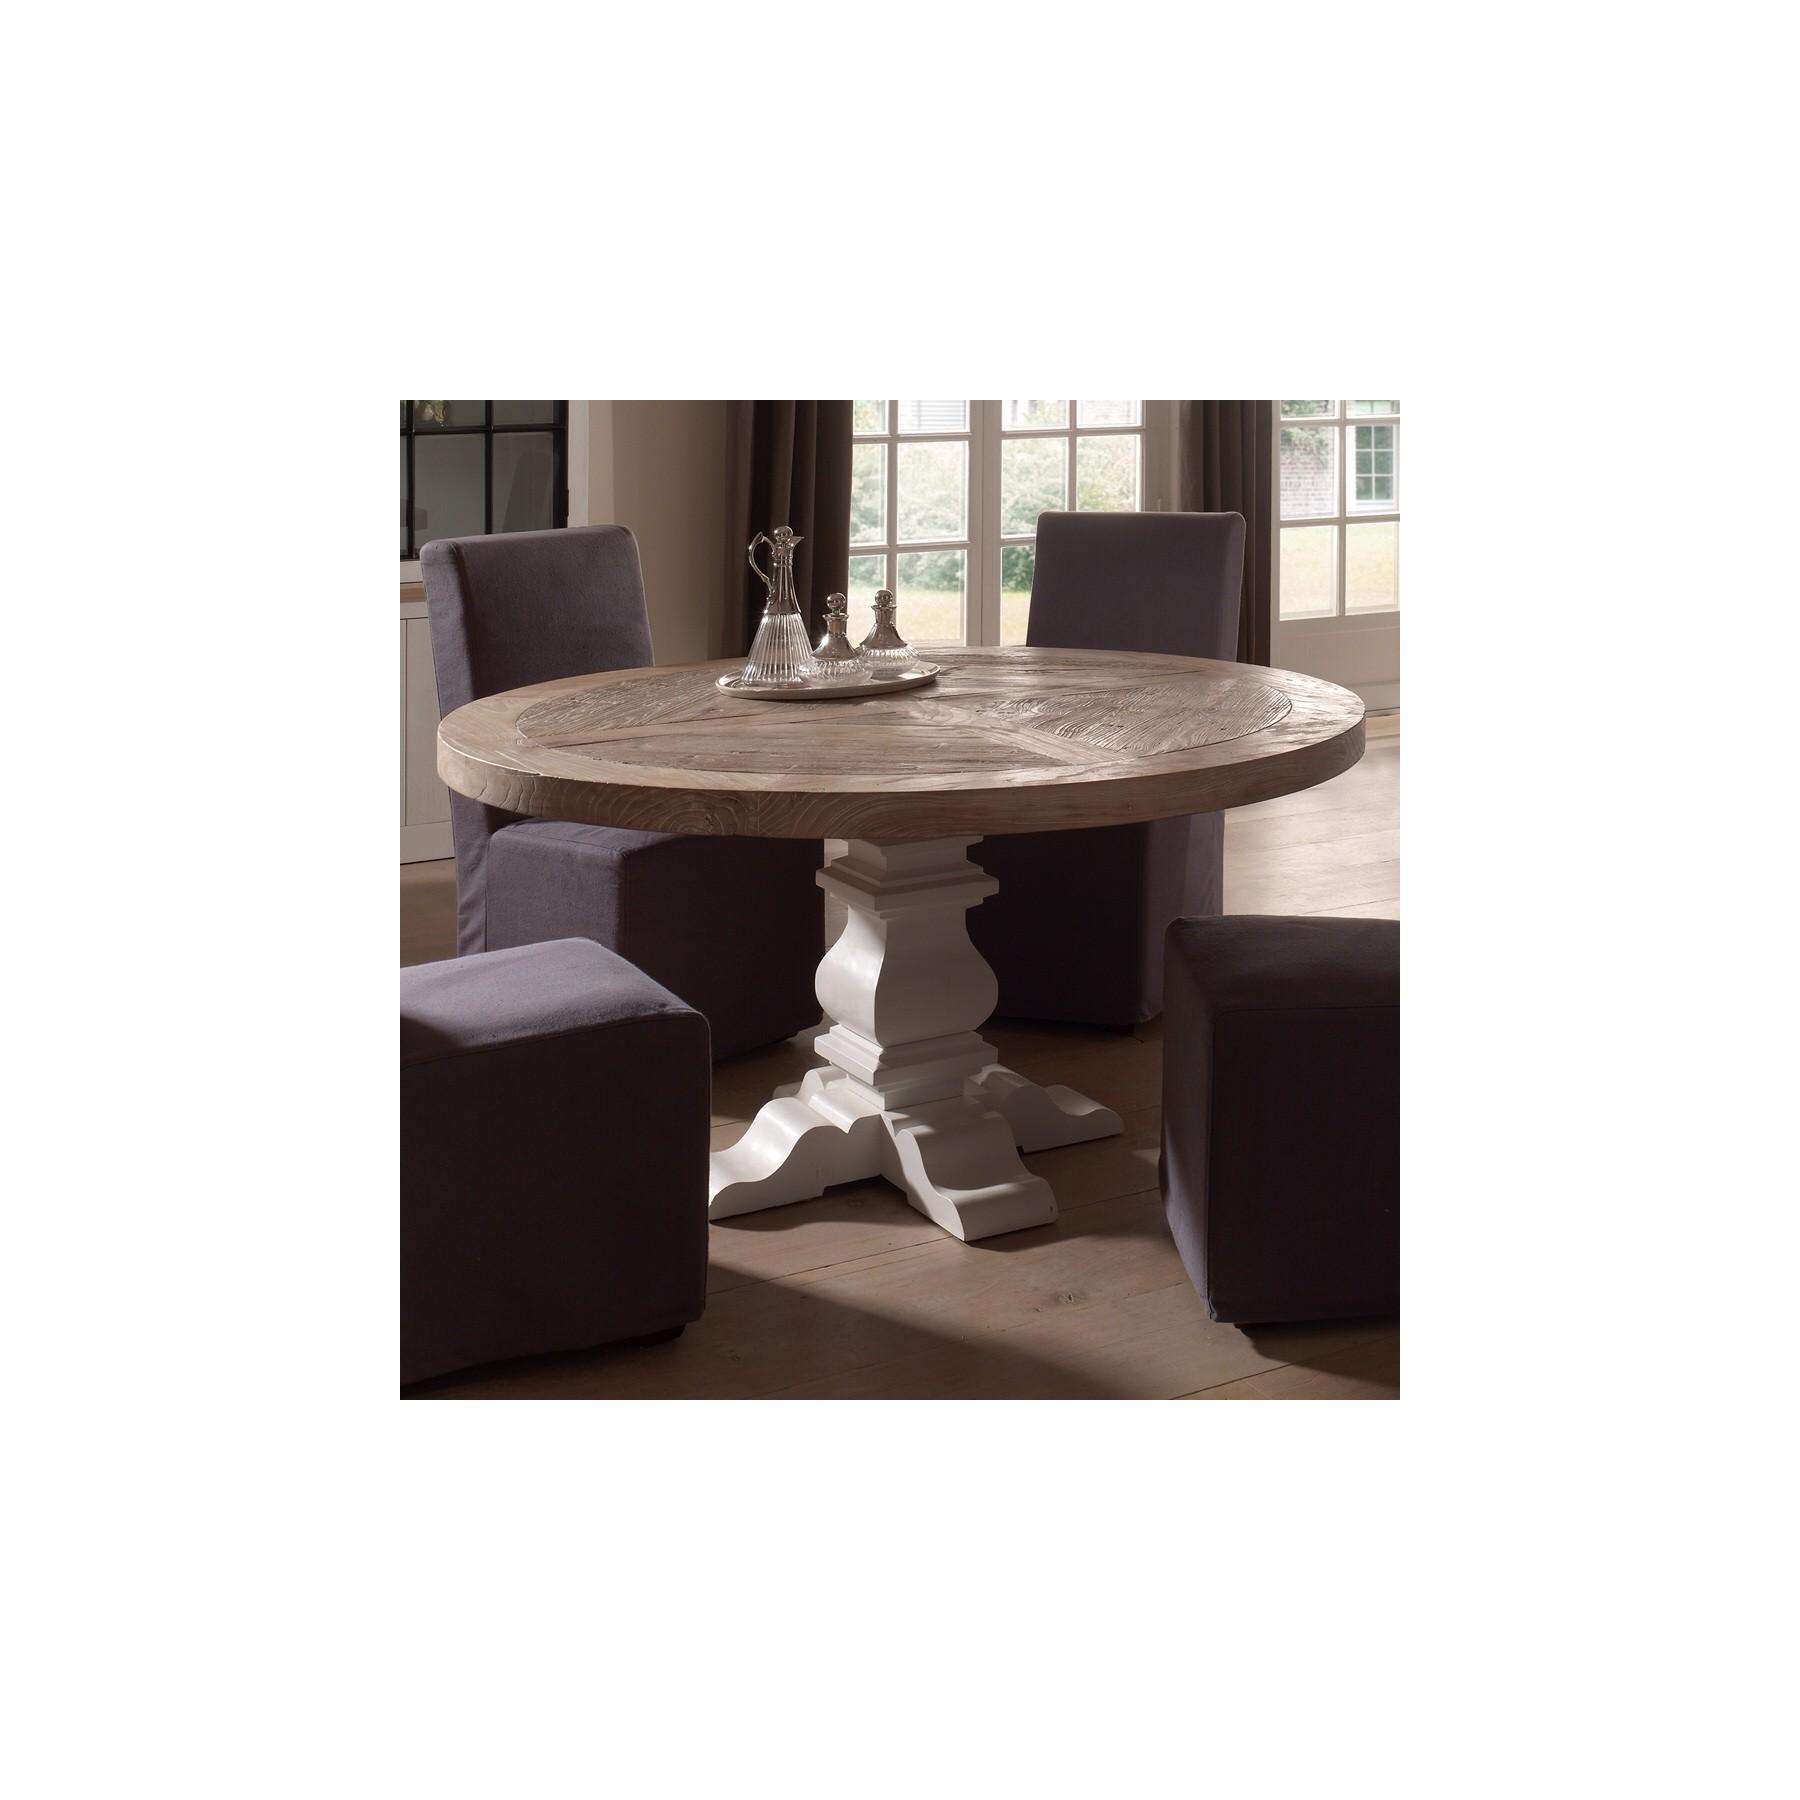 Mesa comedor redonda madera islas baleares pictures car for Comedor mesa redonda